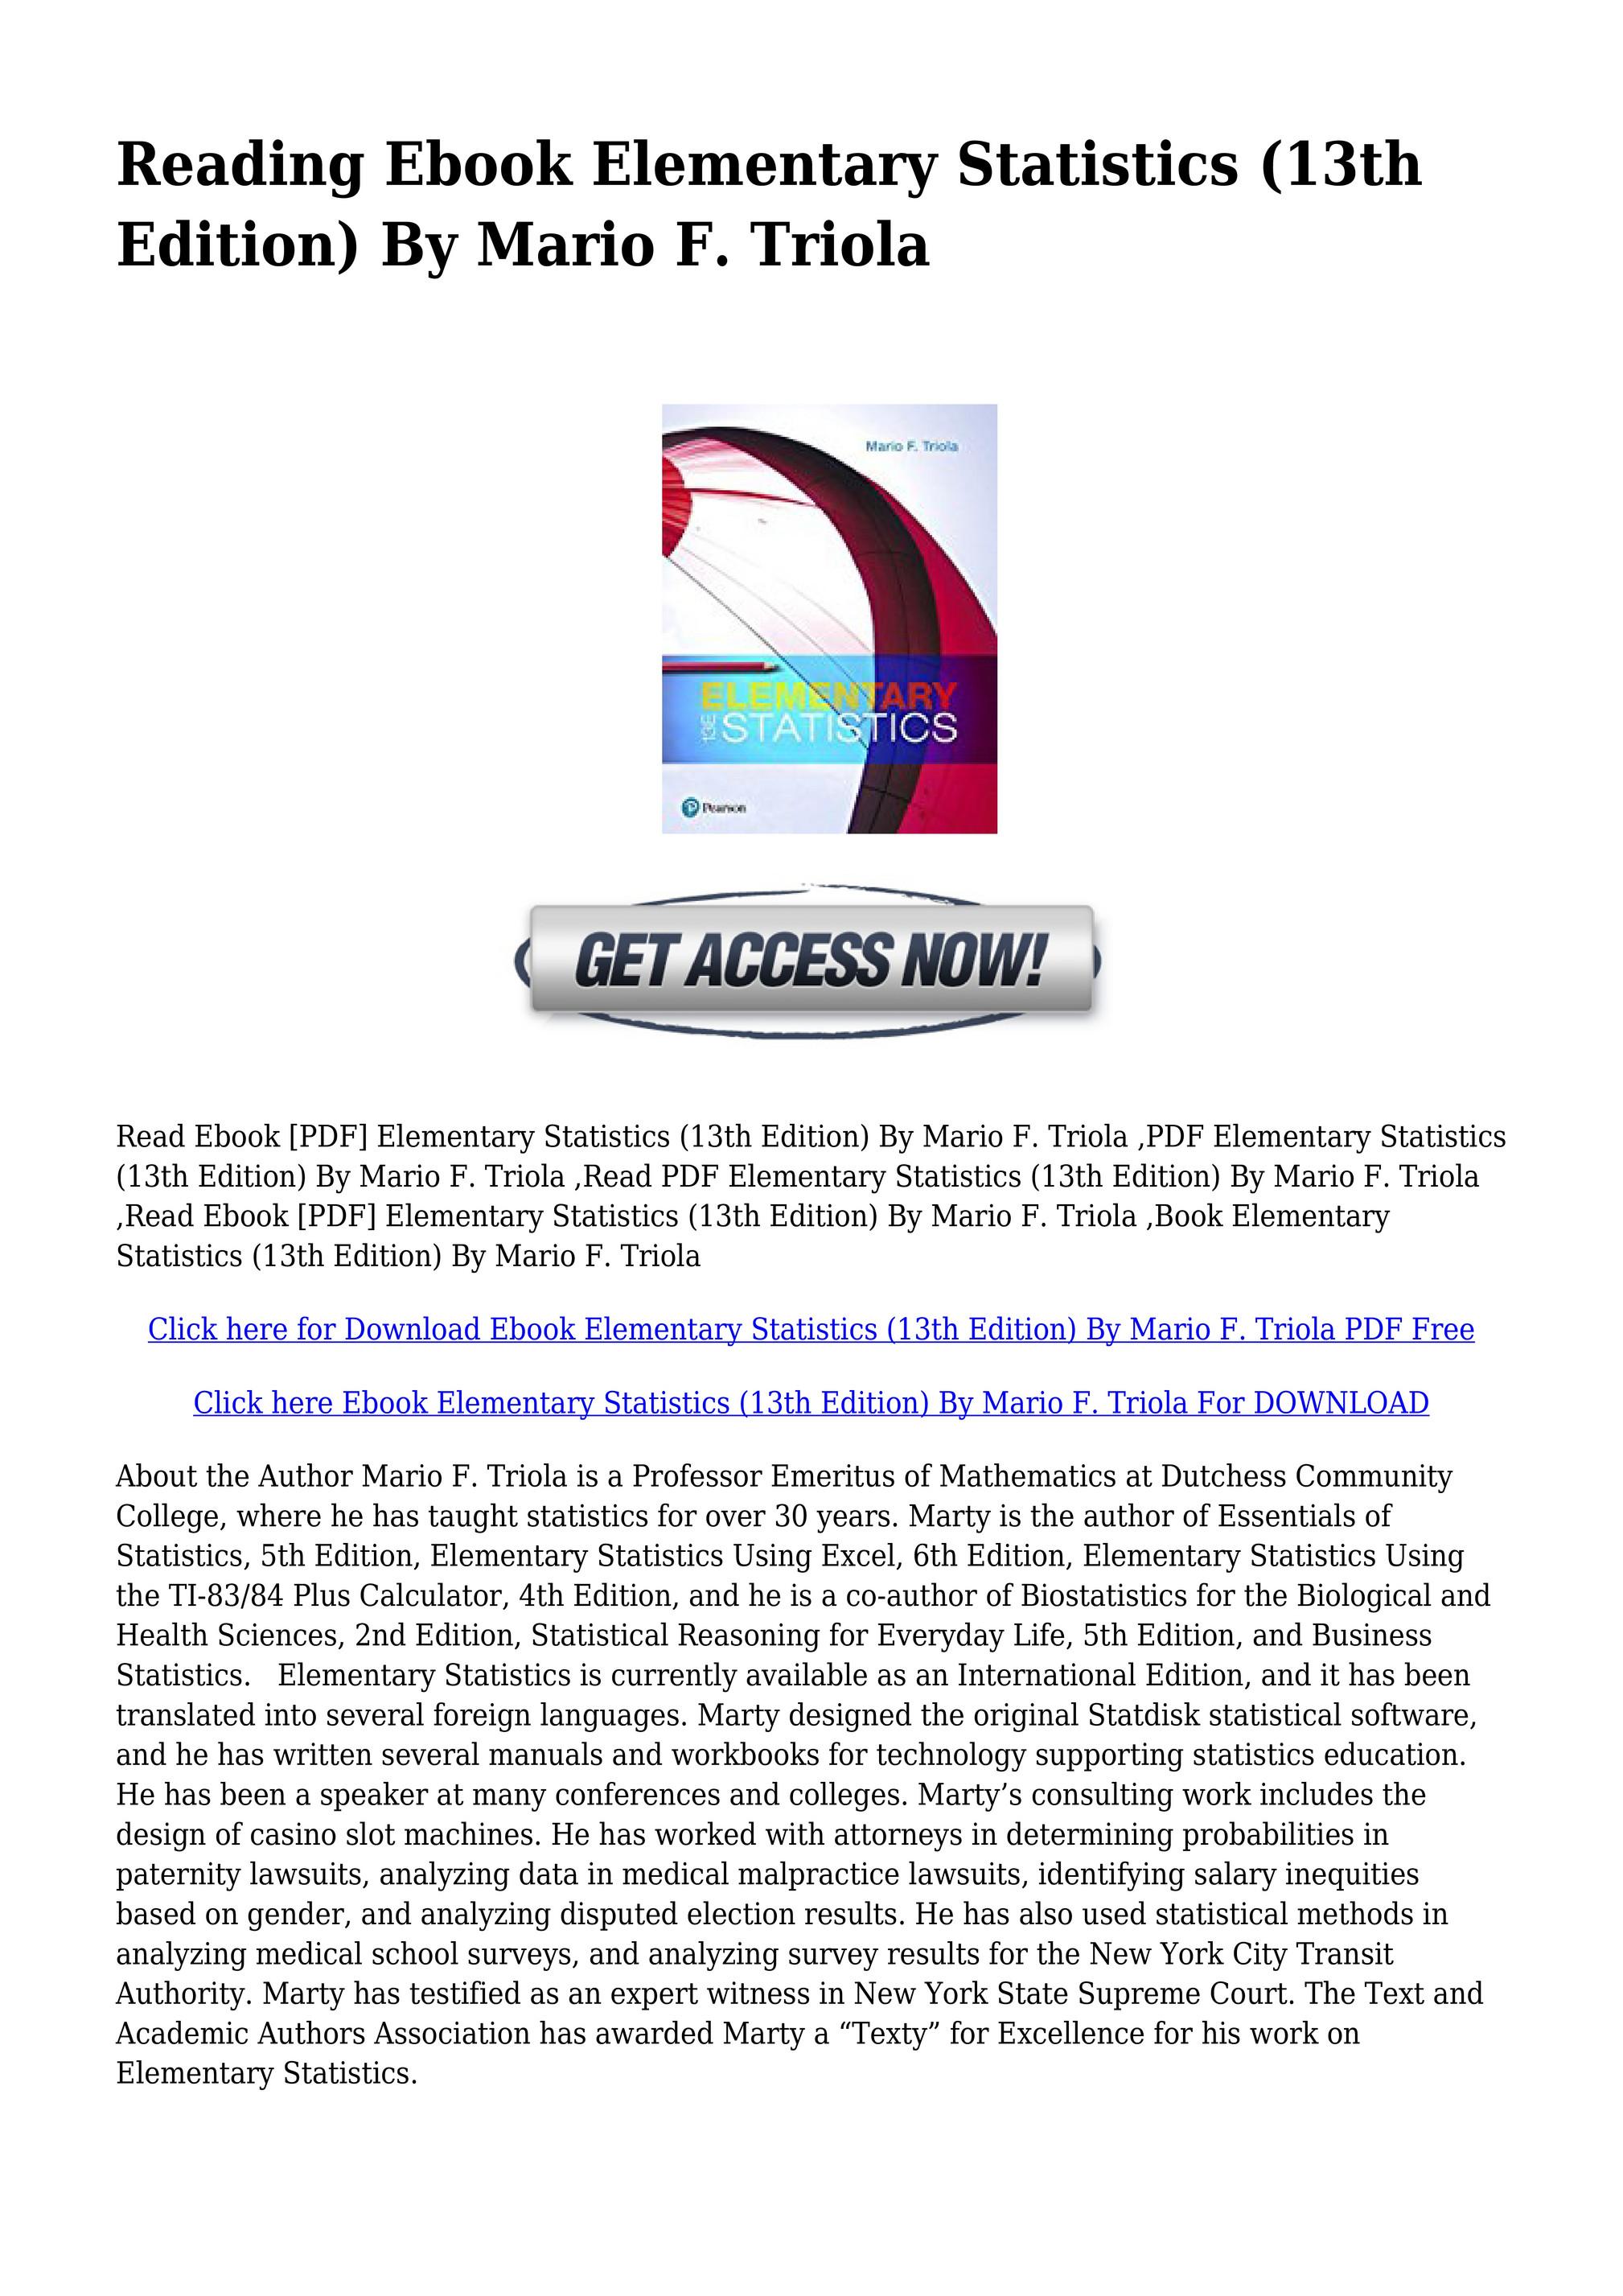 Elementary Statistics 13th Edition Pdf